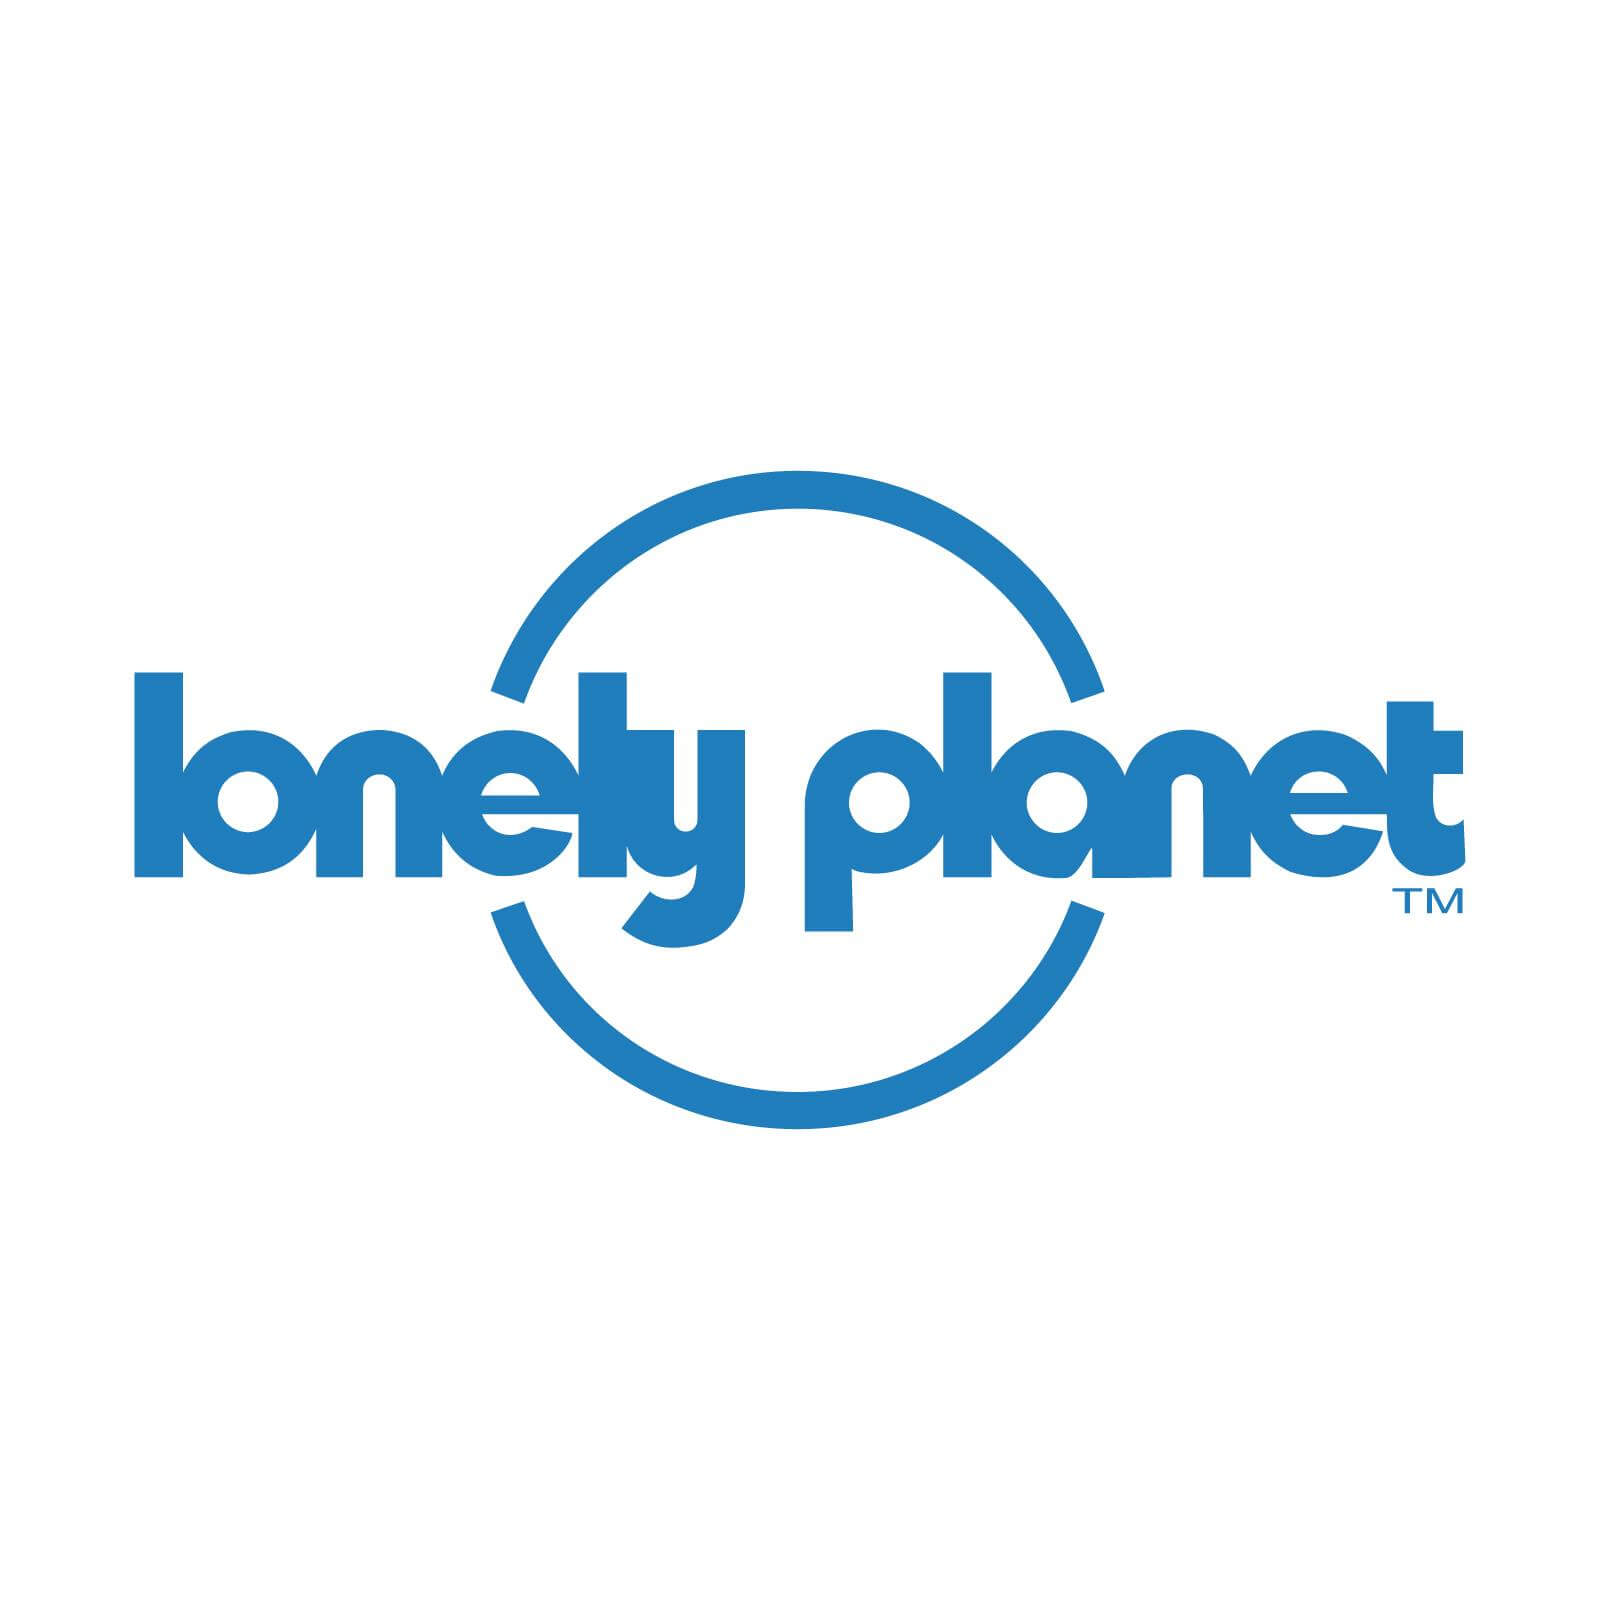 Lonely Planet ČR